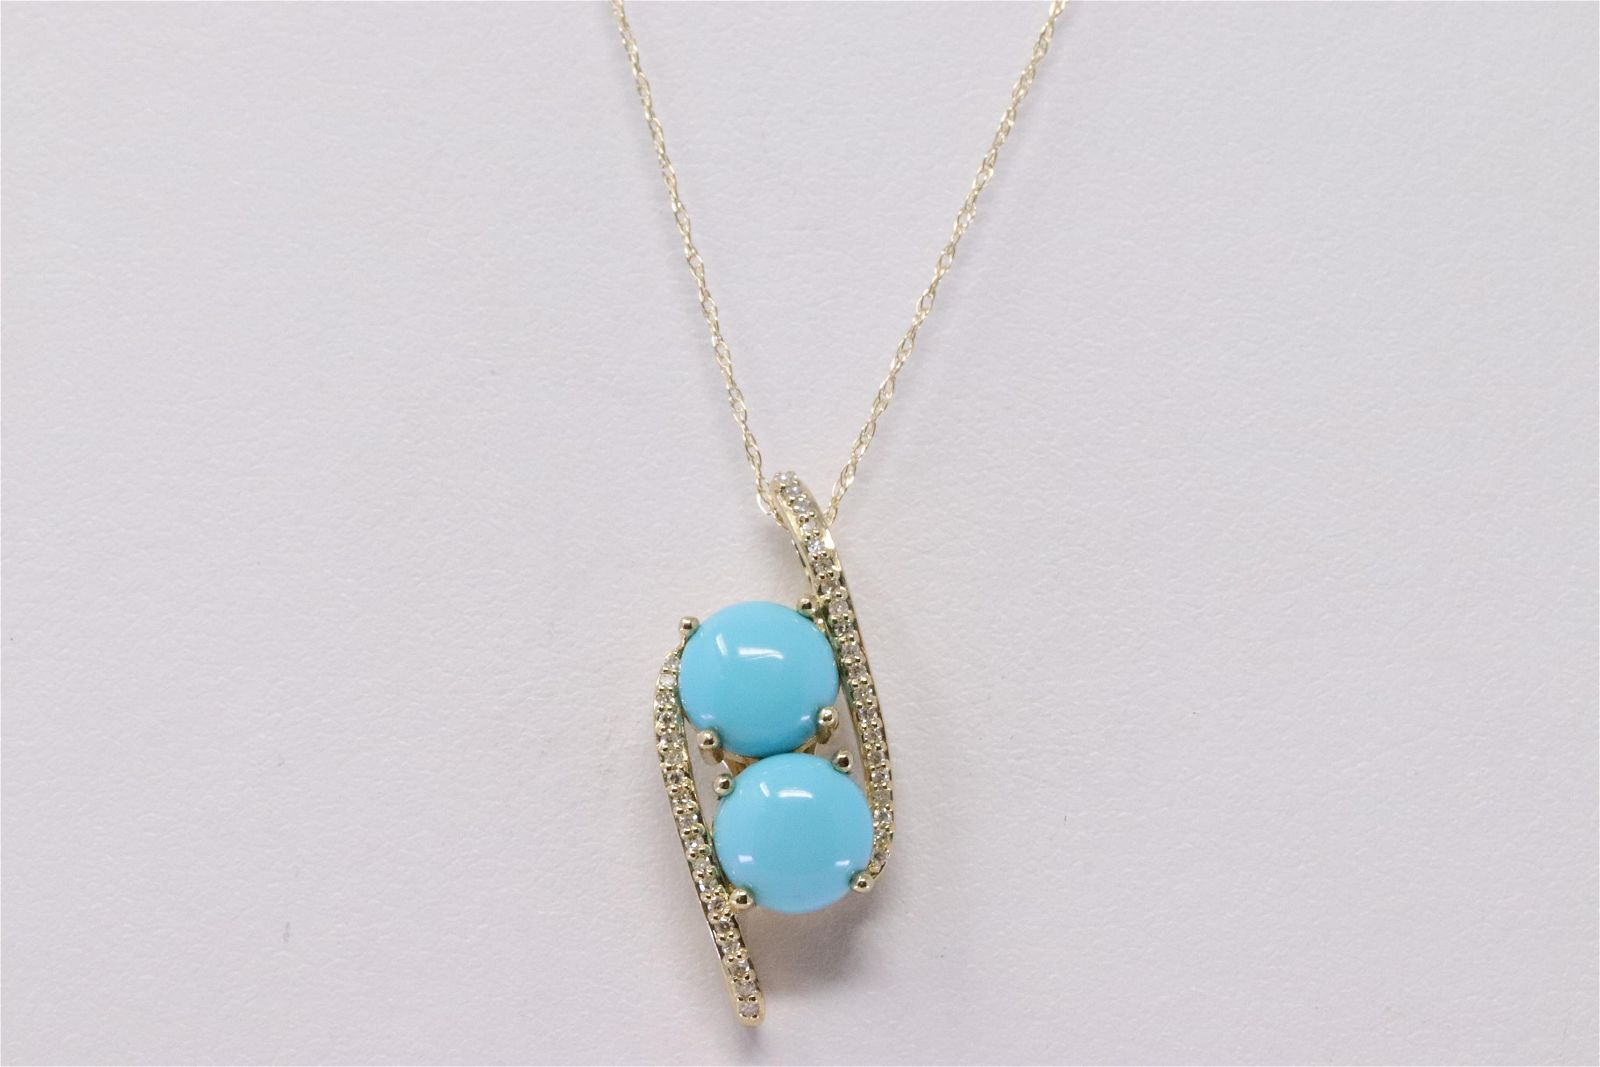 14Kt Yellow Gold Turquoise / Diamond Pendant &